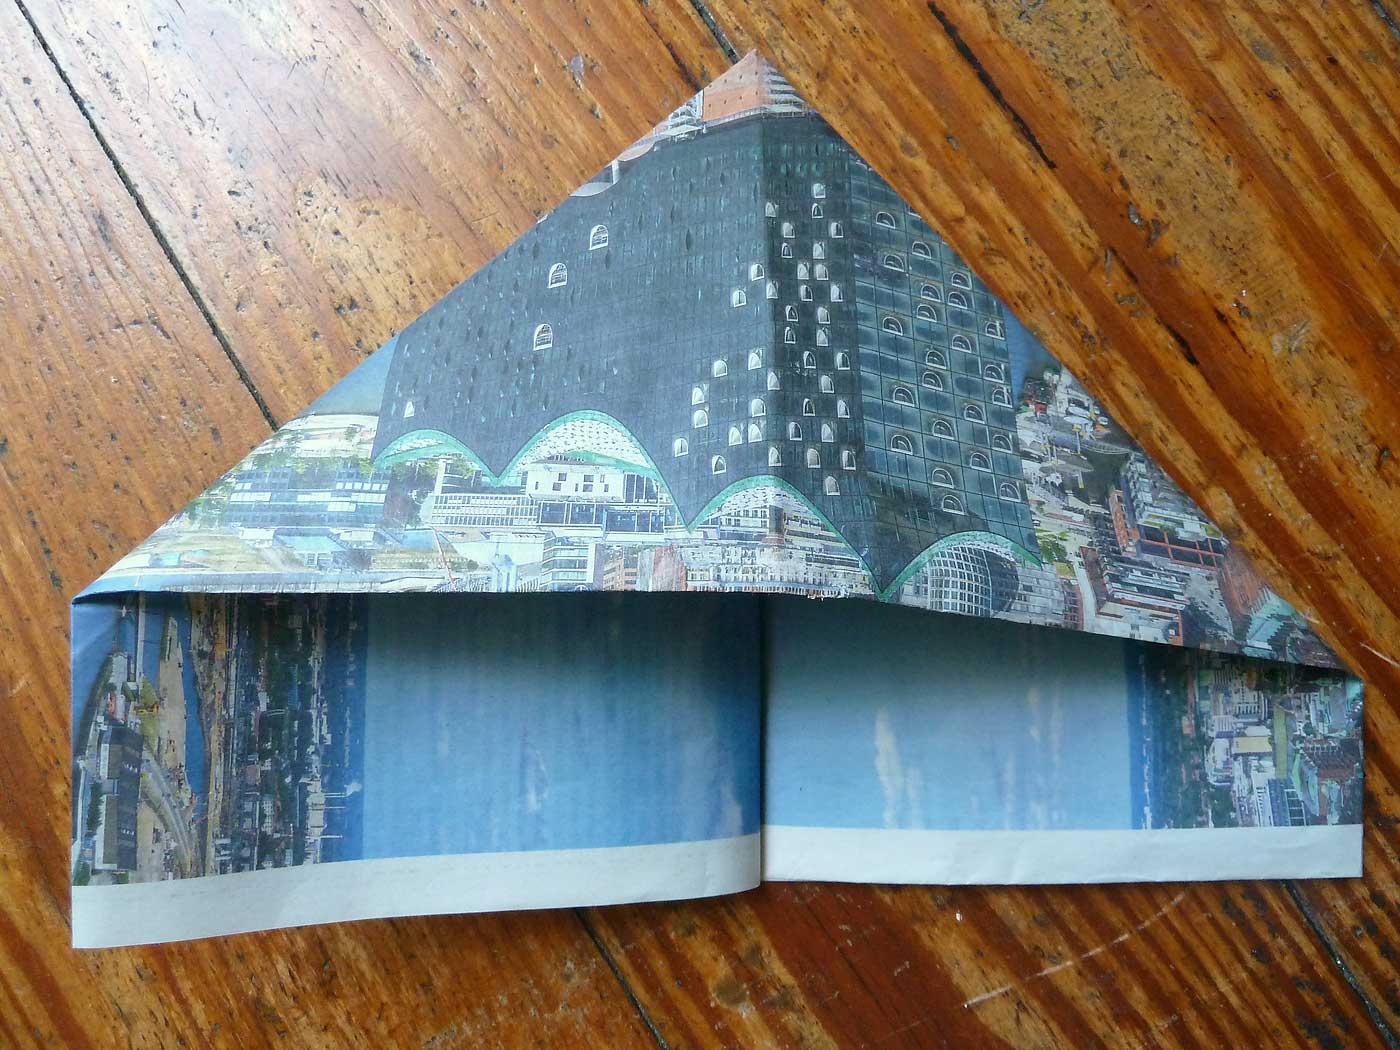 Origami Papierkorb Bild 8